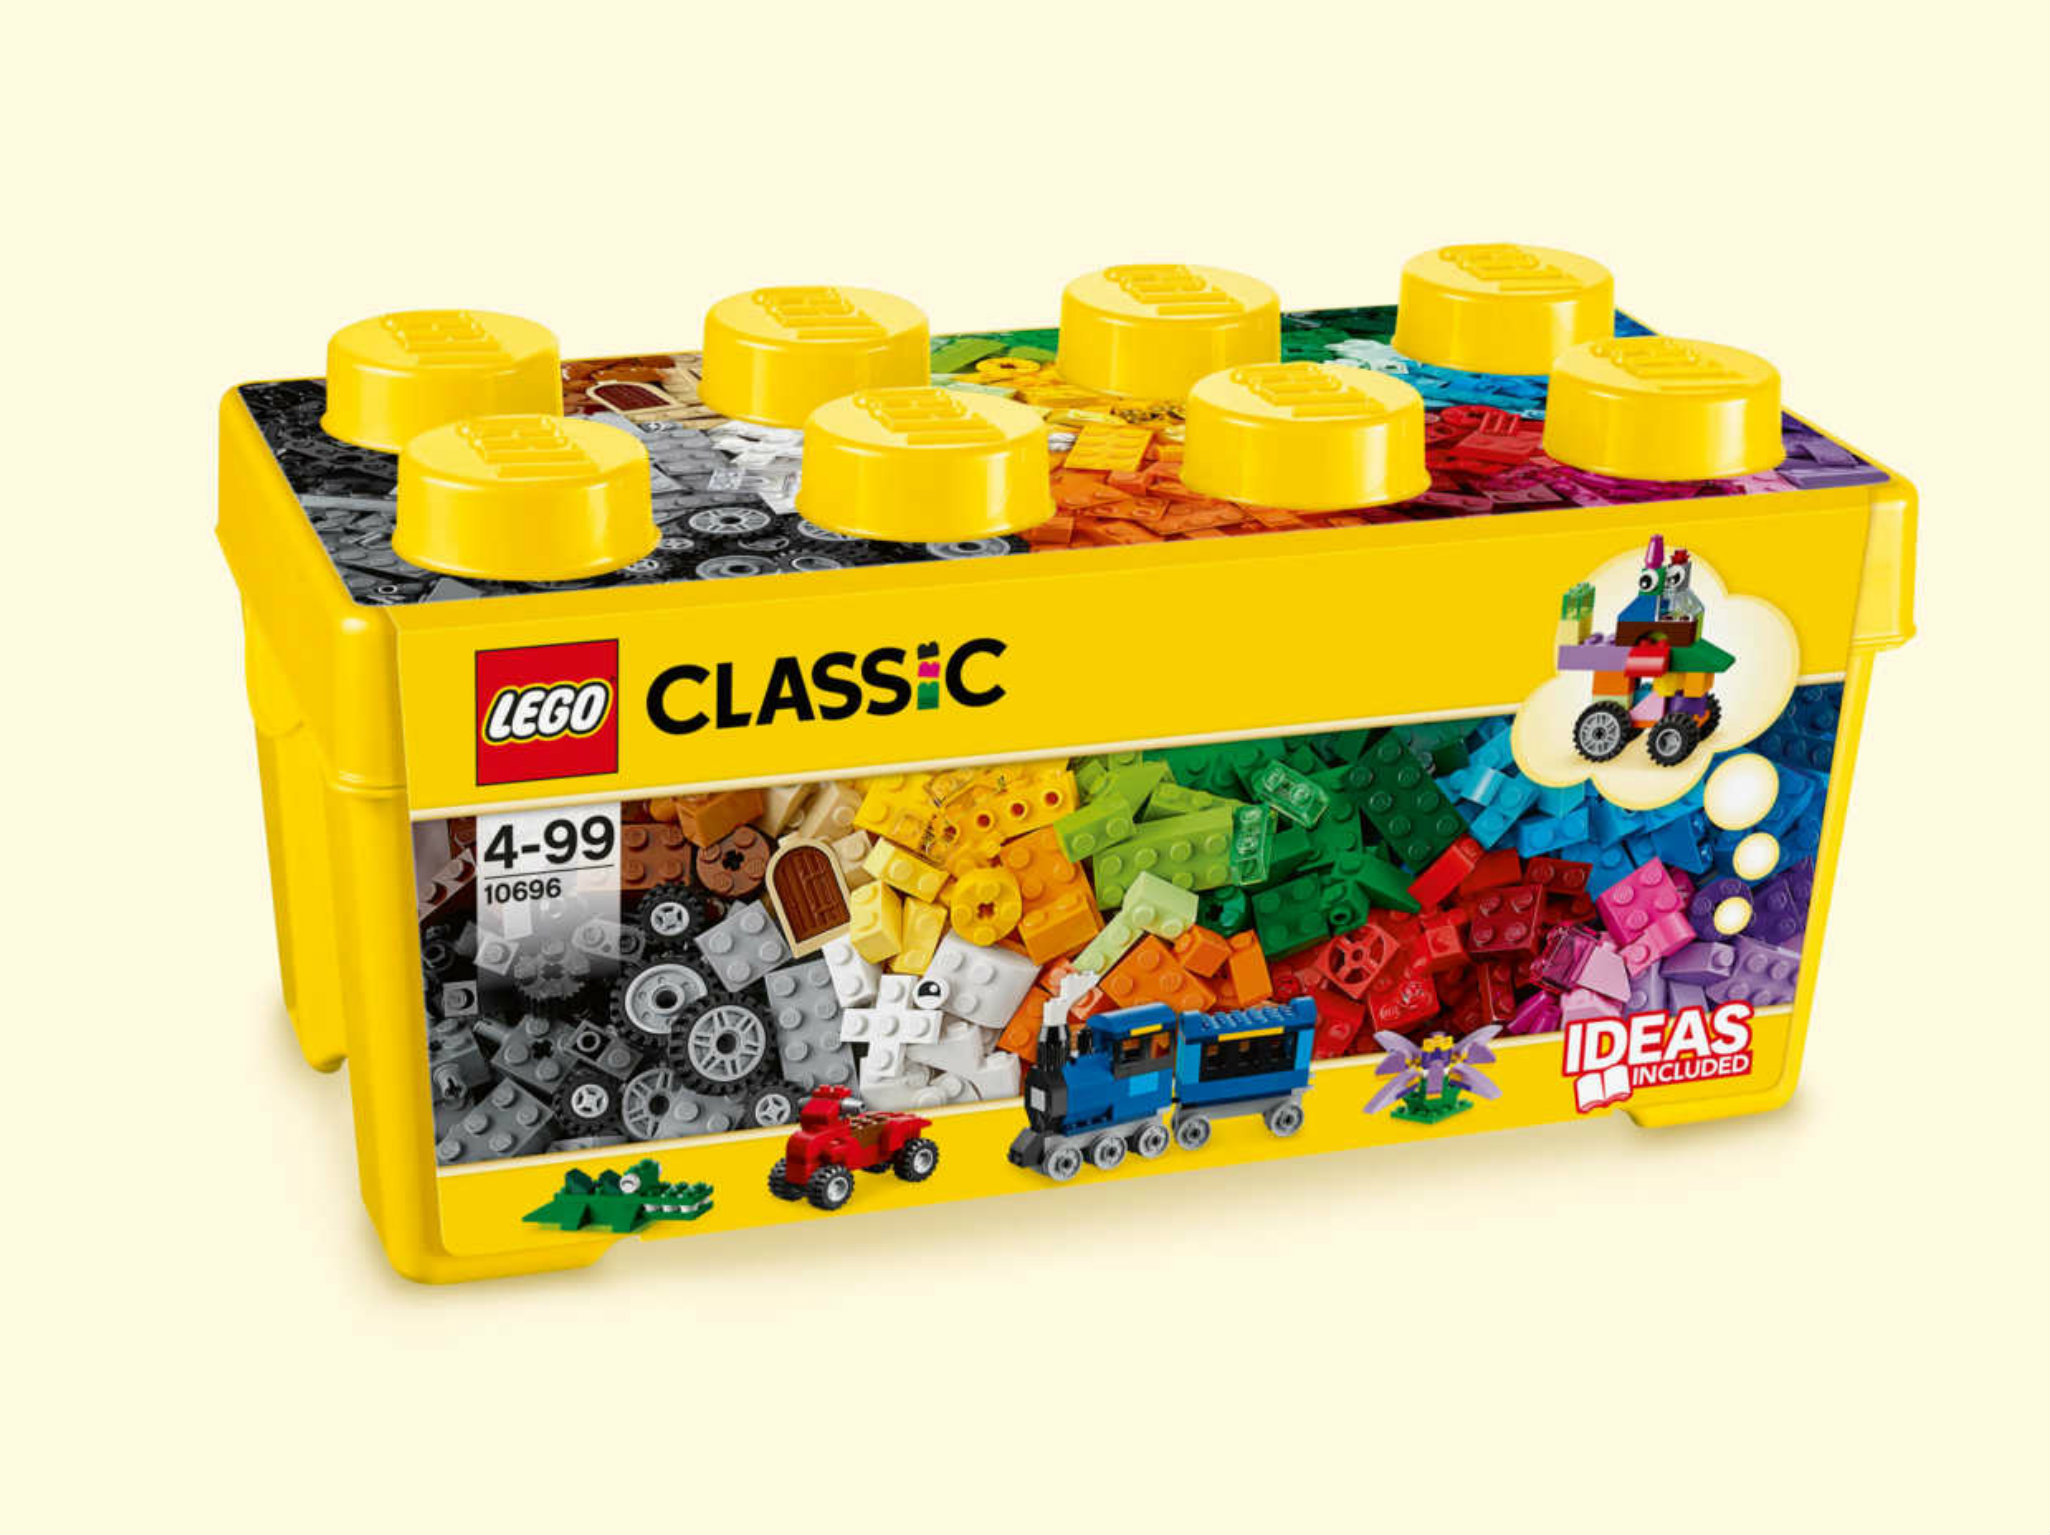 La caja clásica de Lego para Navidad